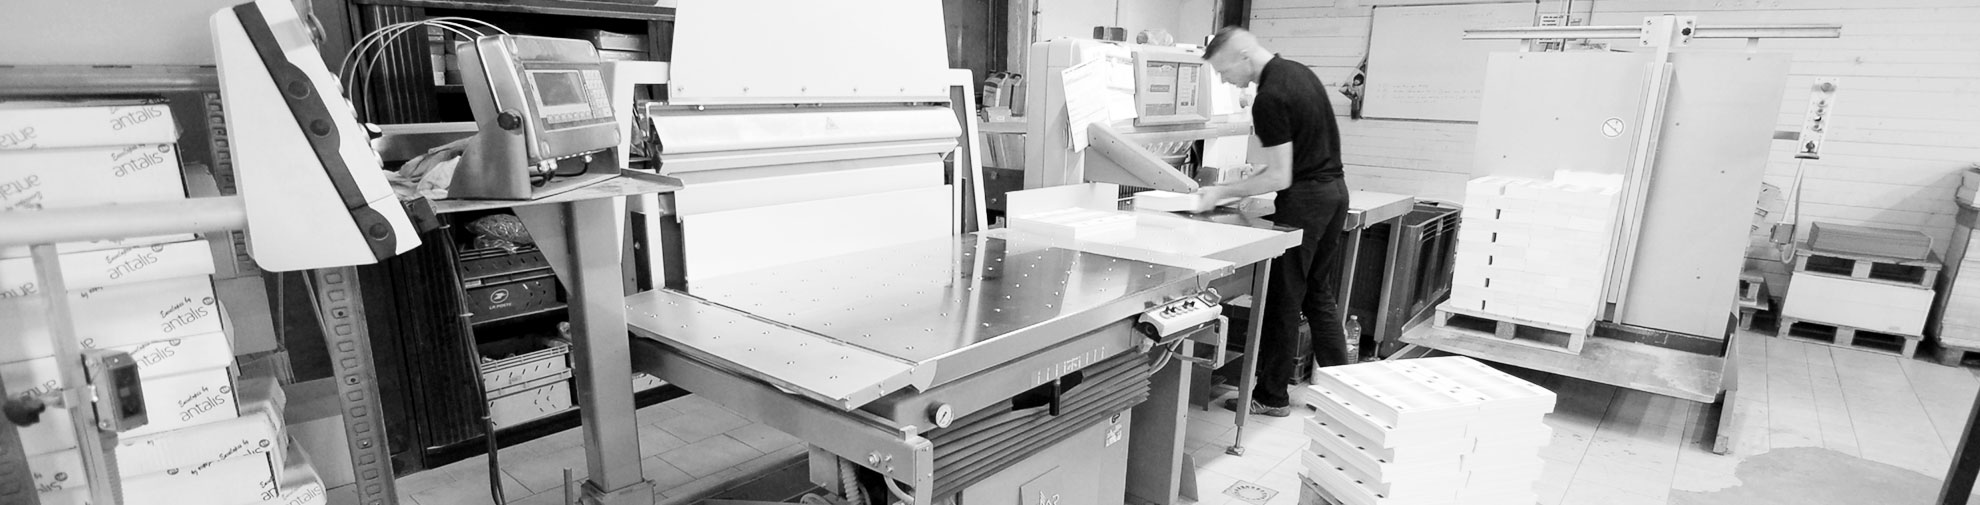 Imprimerie SODAL - Massicot